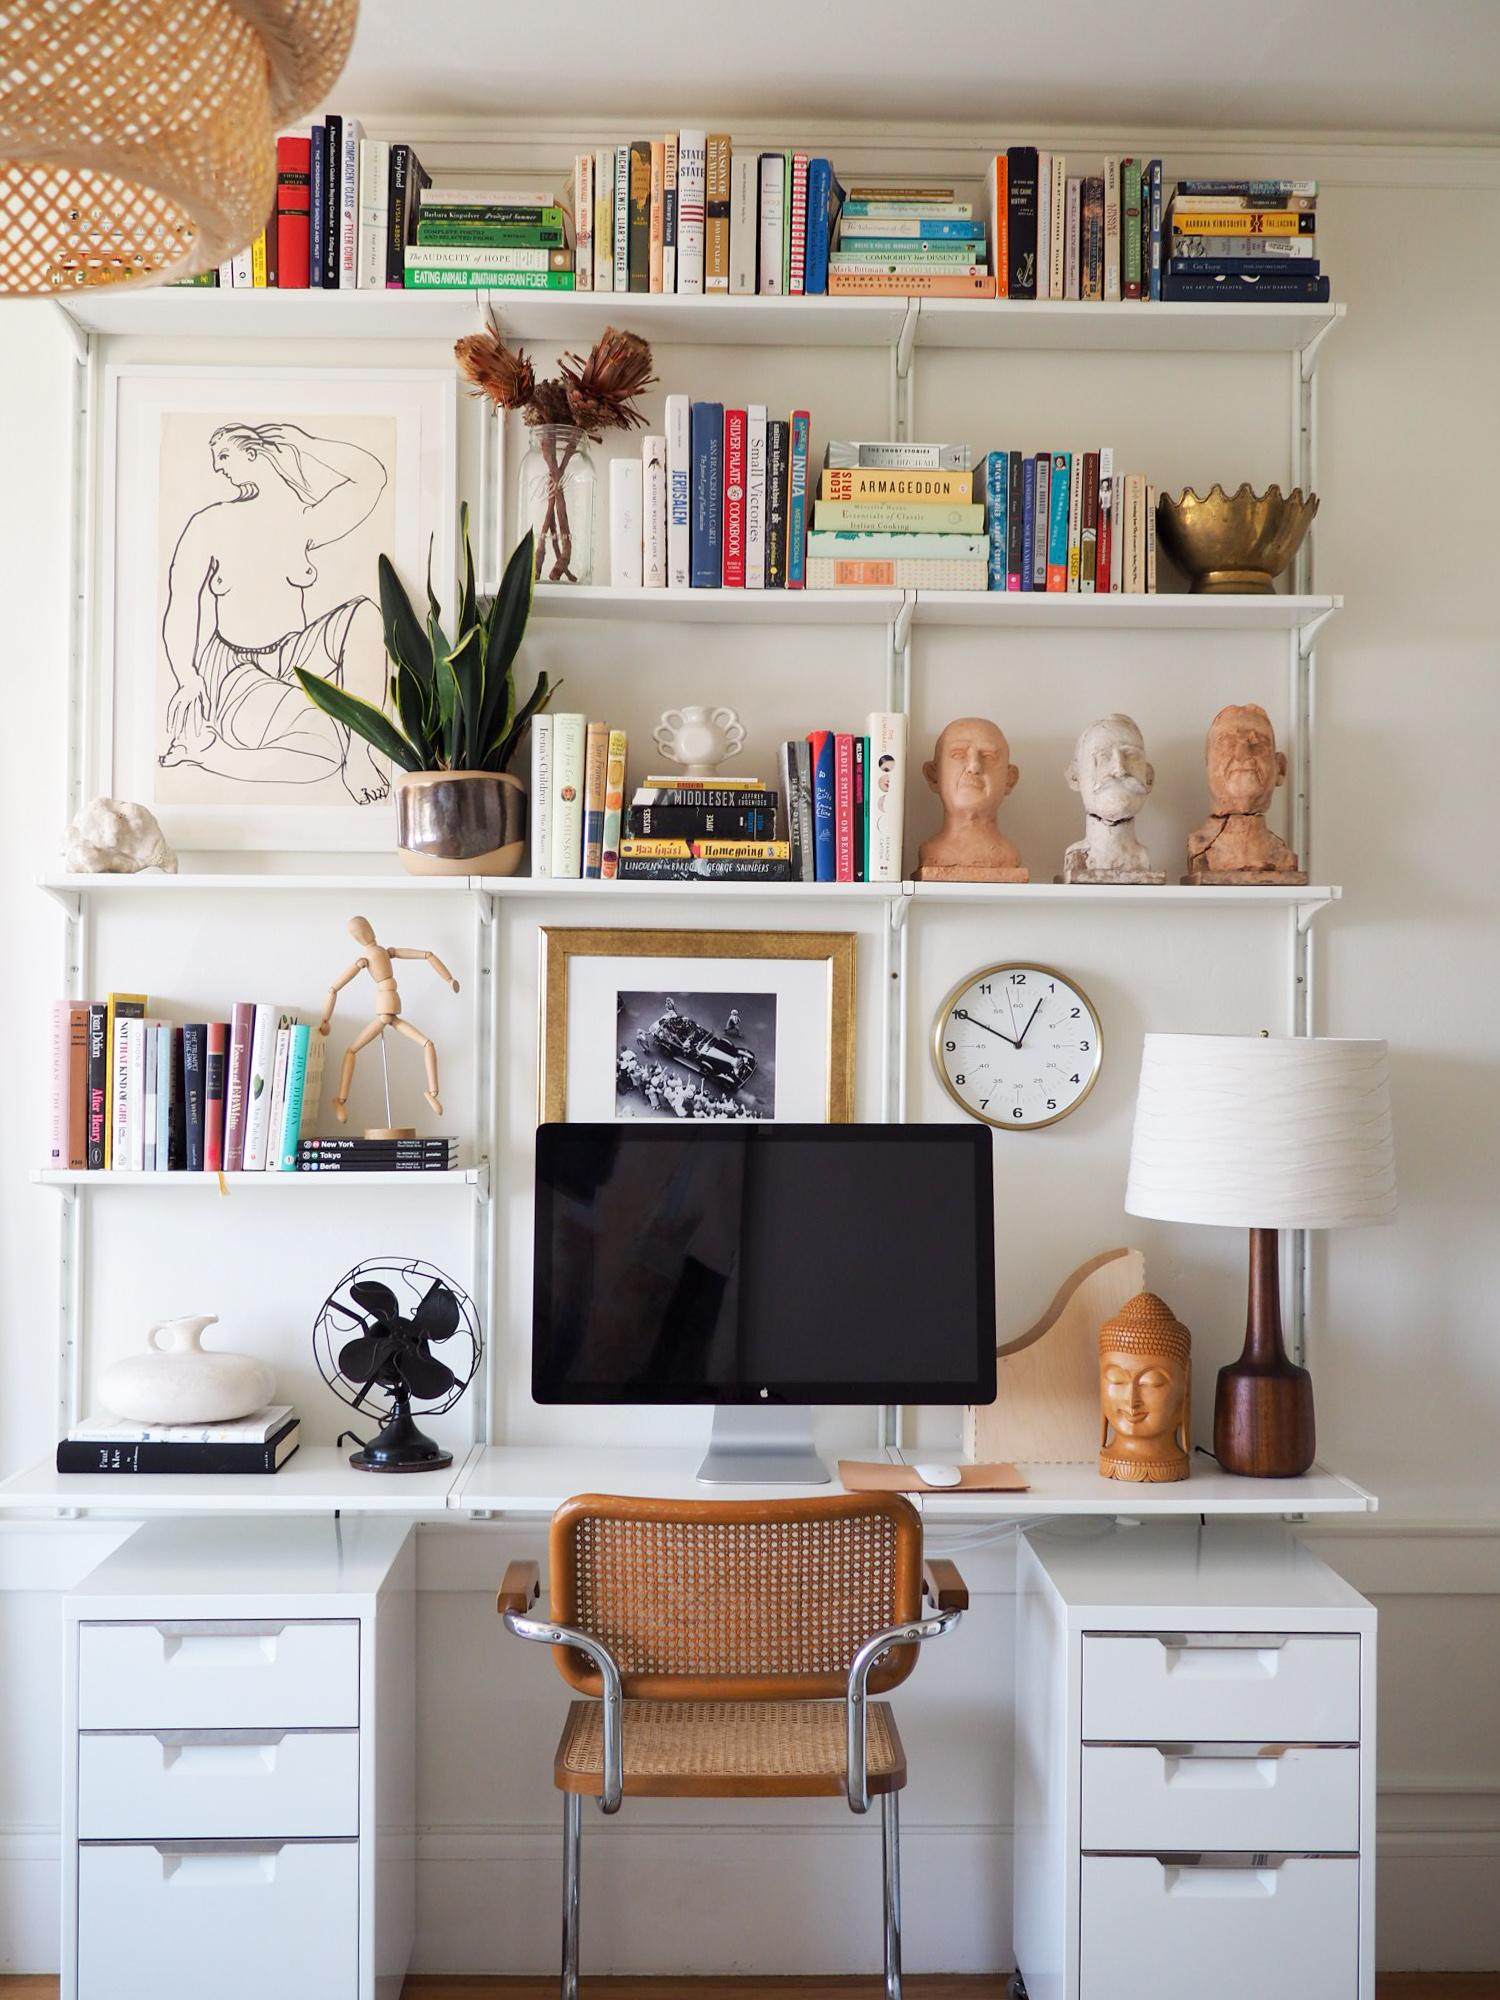 Figure drawing, vintage:  similar . White frame:  Ikea . Marcel Bruer-style desk chair, via Craigslist:  similar . White file cabinets, via Craigslist:  CB2 . Wall shelving:  Ikea .Brass wall clock:  Target . Gold picture frame:  Ikea . Leather mousepad:  Etsy .Walnut mid-century lamp base, vintage via eBay:  similar . Cream woven lamp shade:  Target .